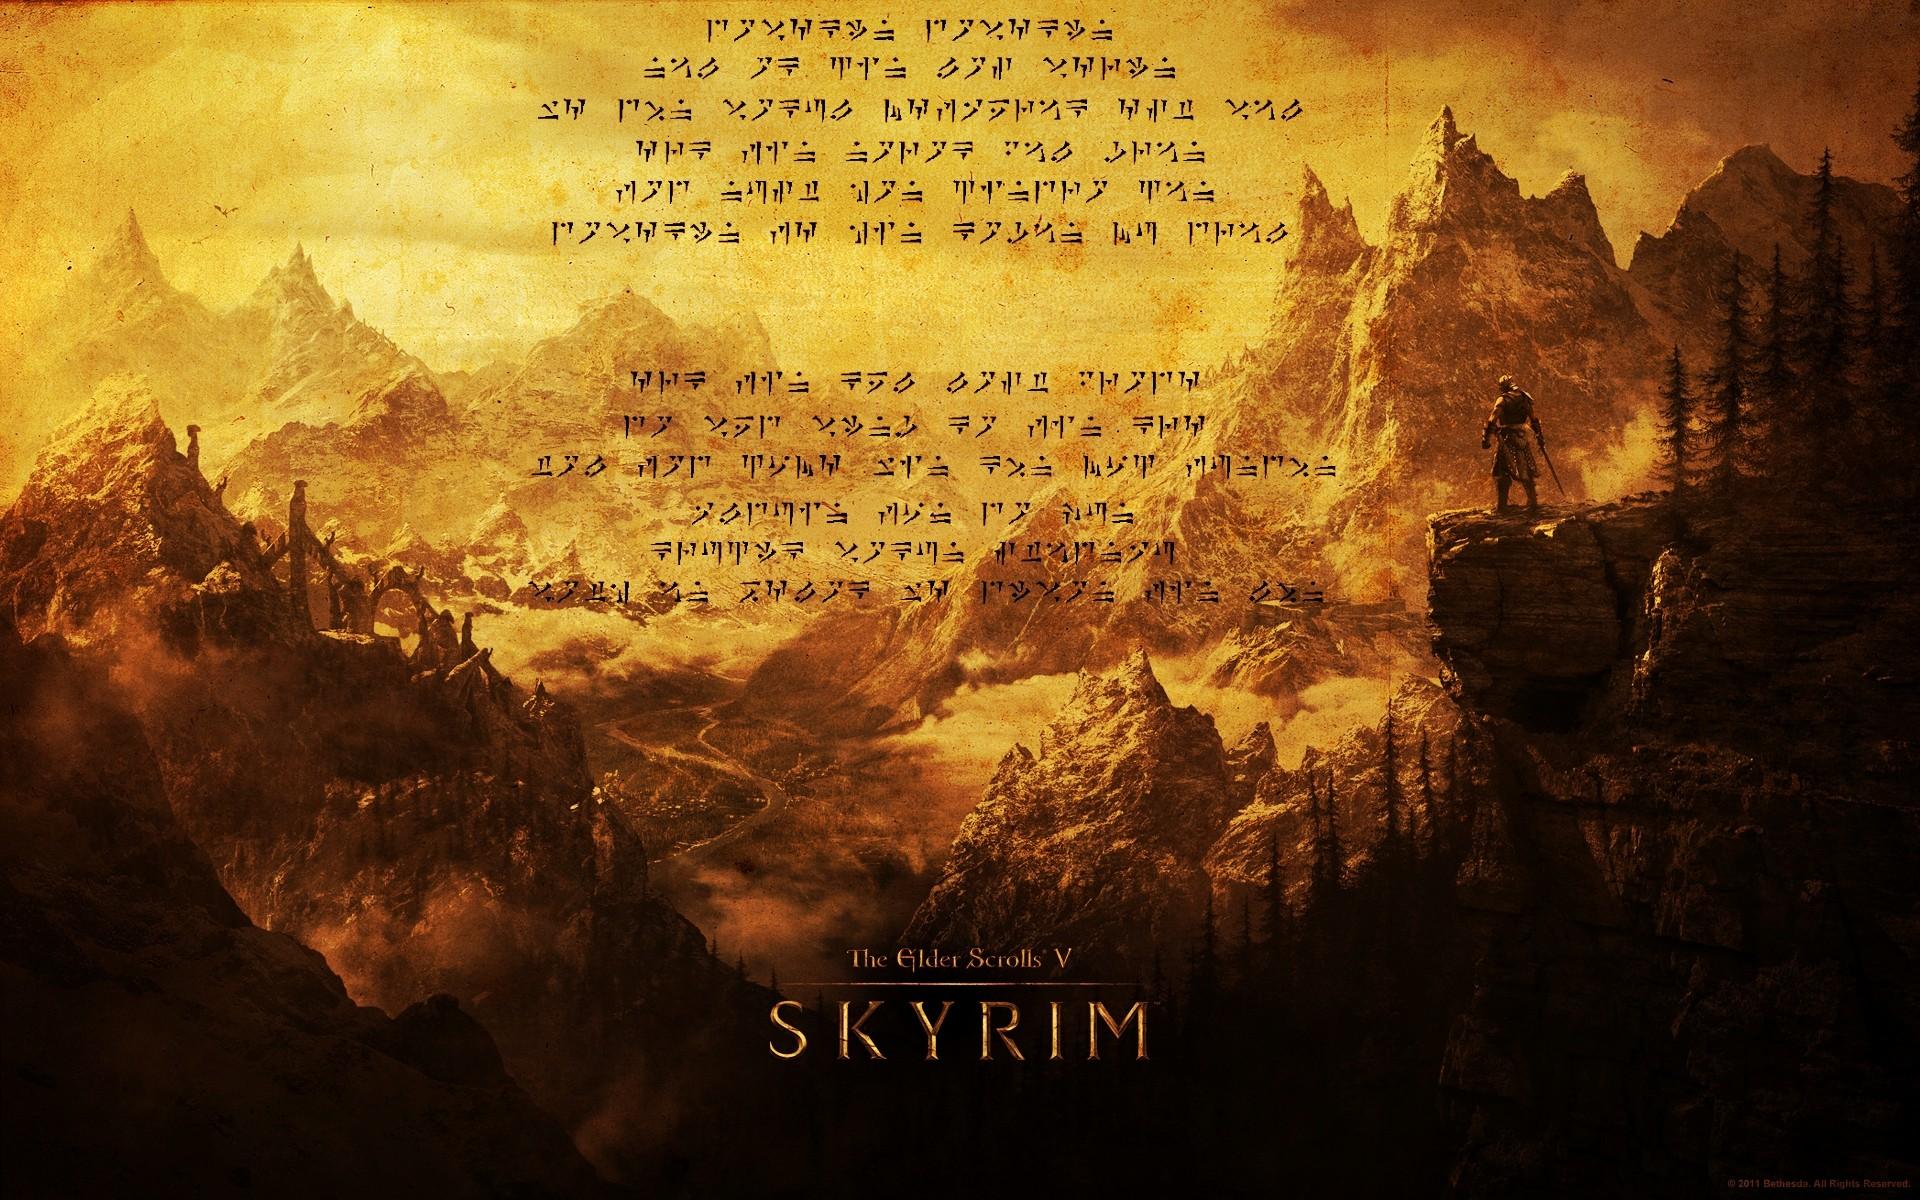 Video Games The Elder Scrolls V Skyrim Dragonborn Screenshot Album Cover